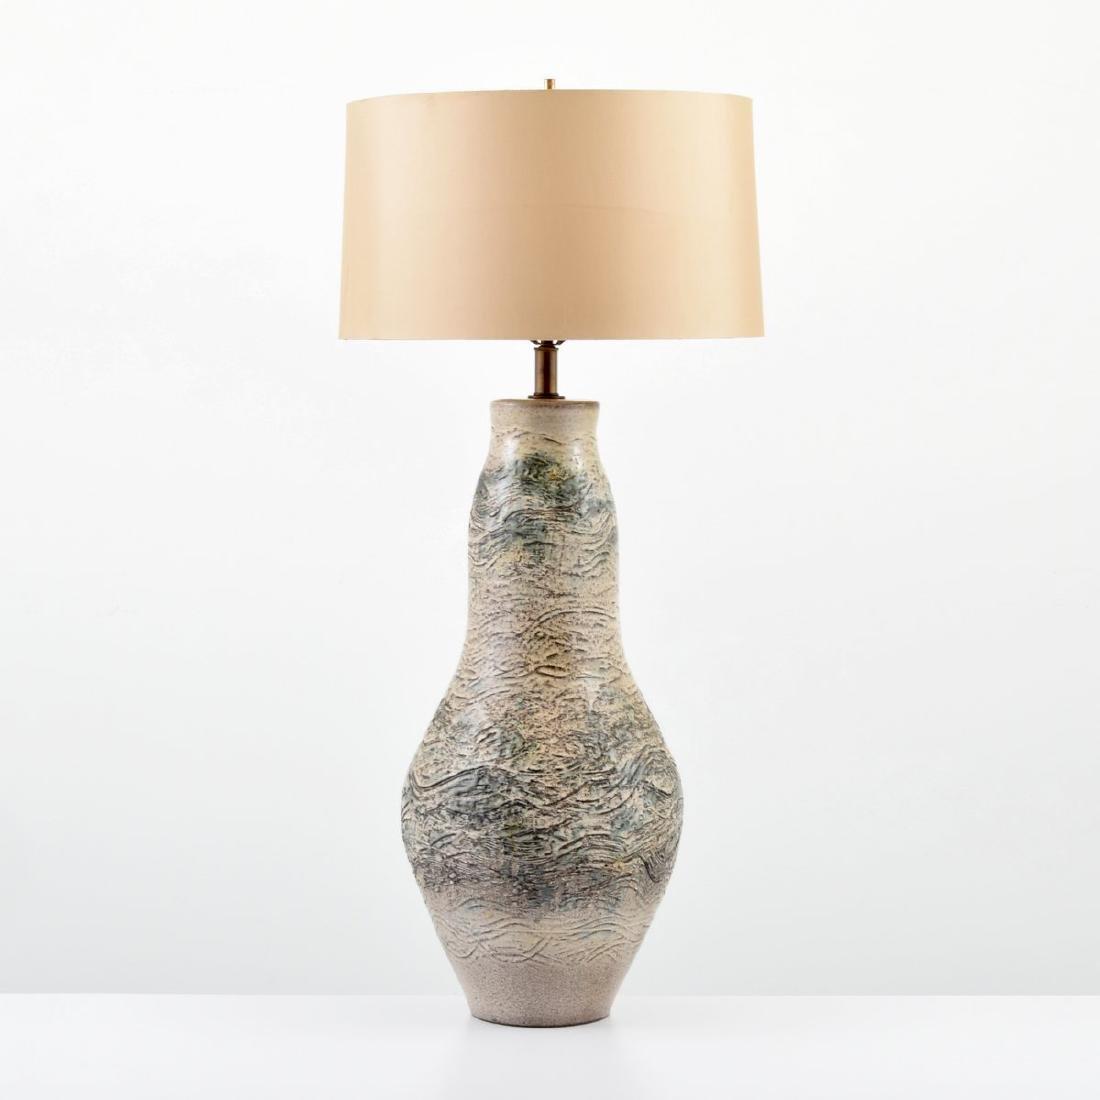 Massive Modern Table Lamp